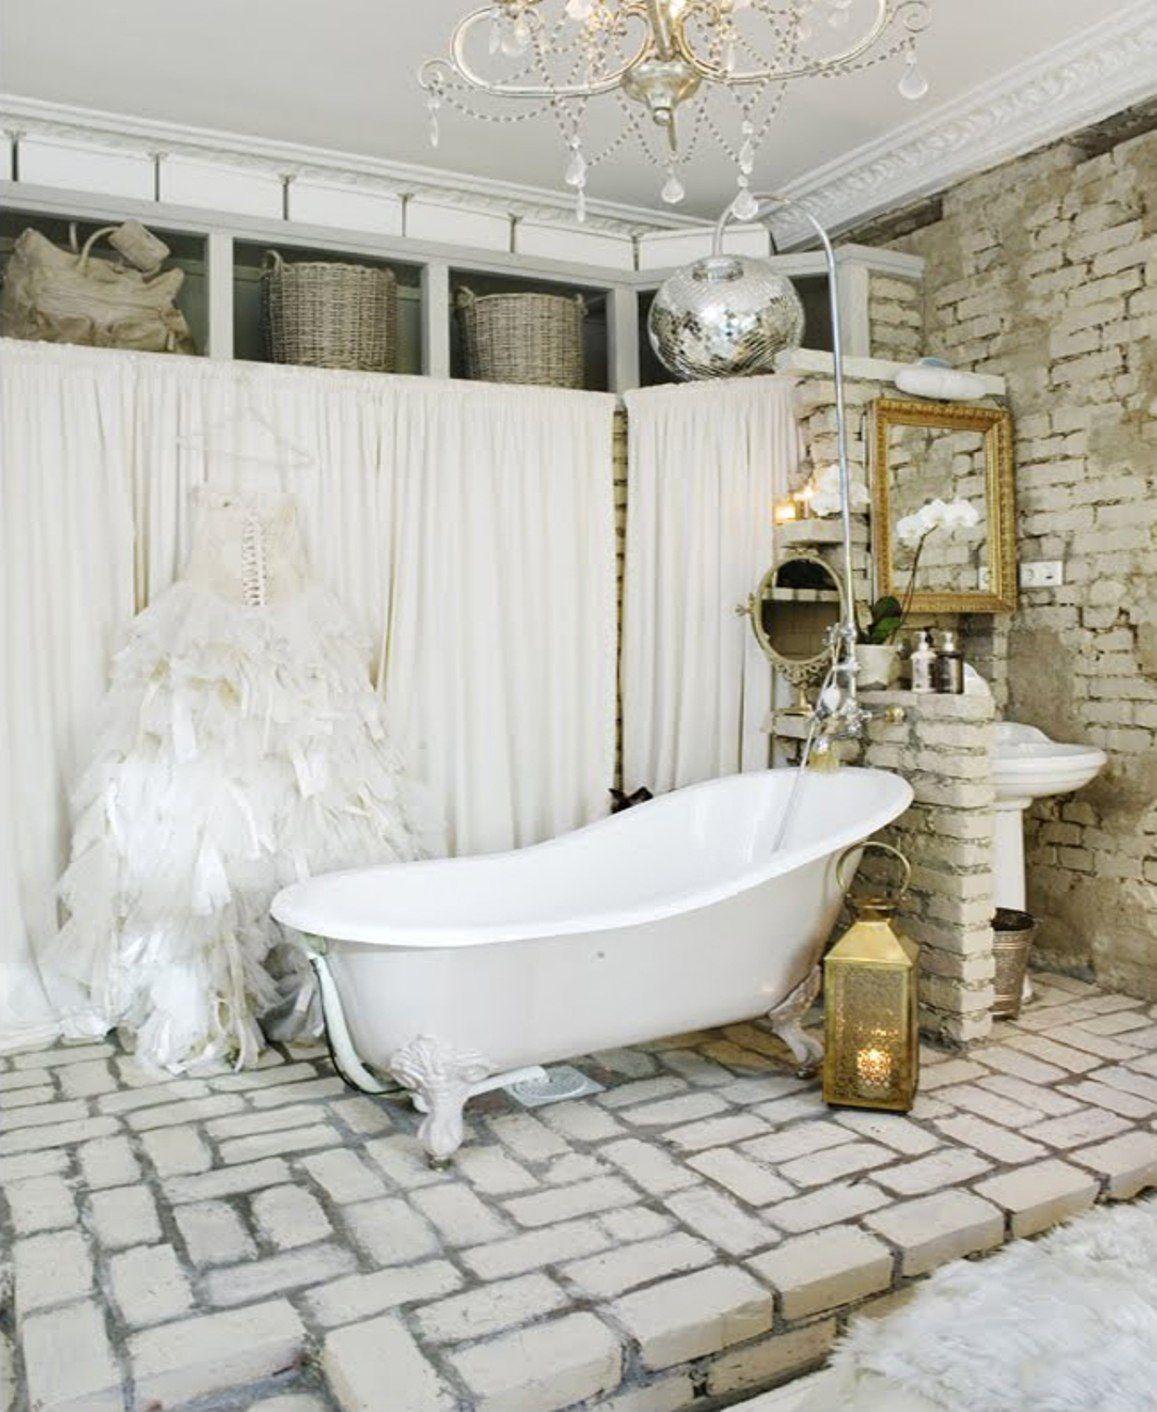 Floor Vintage Bathroom Decor